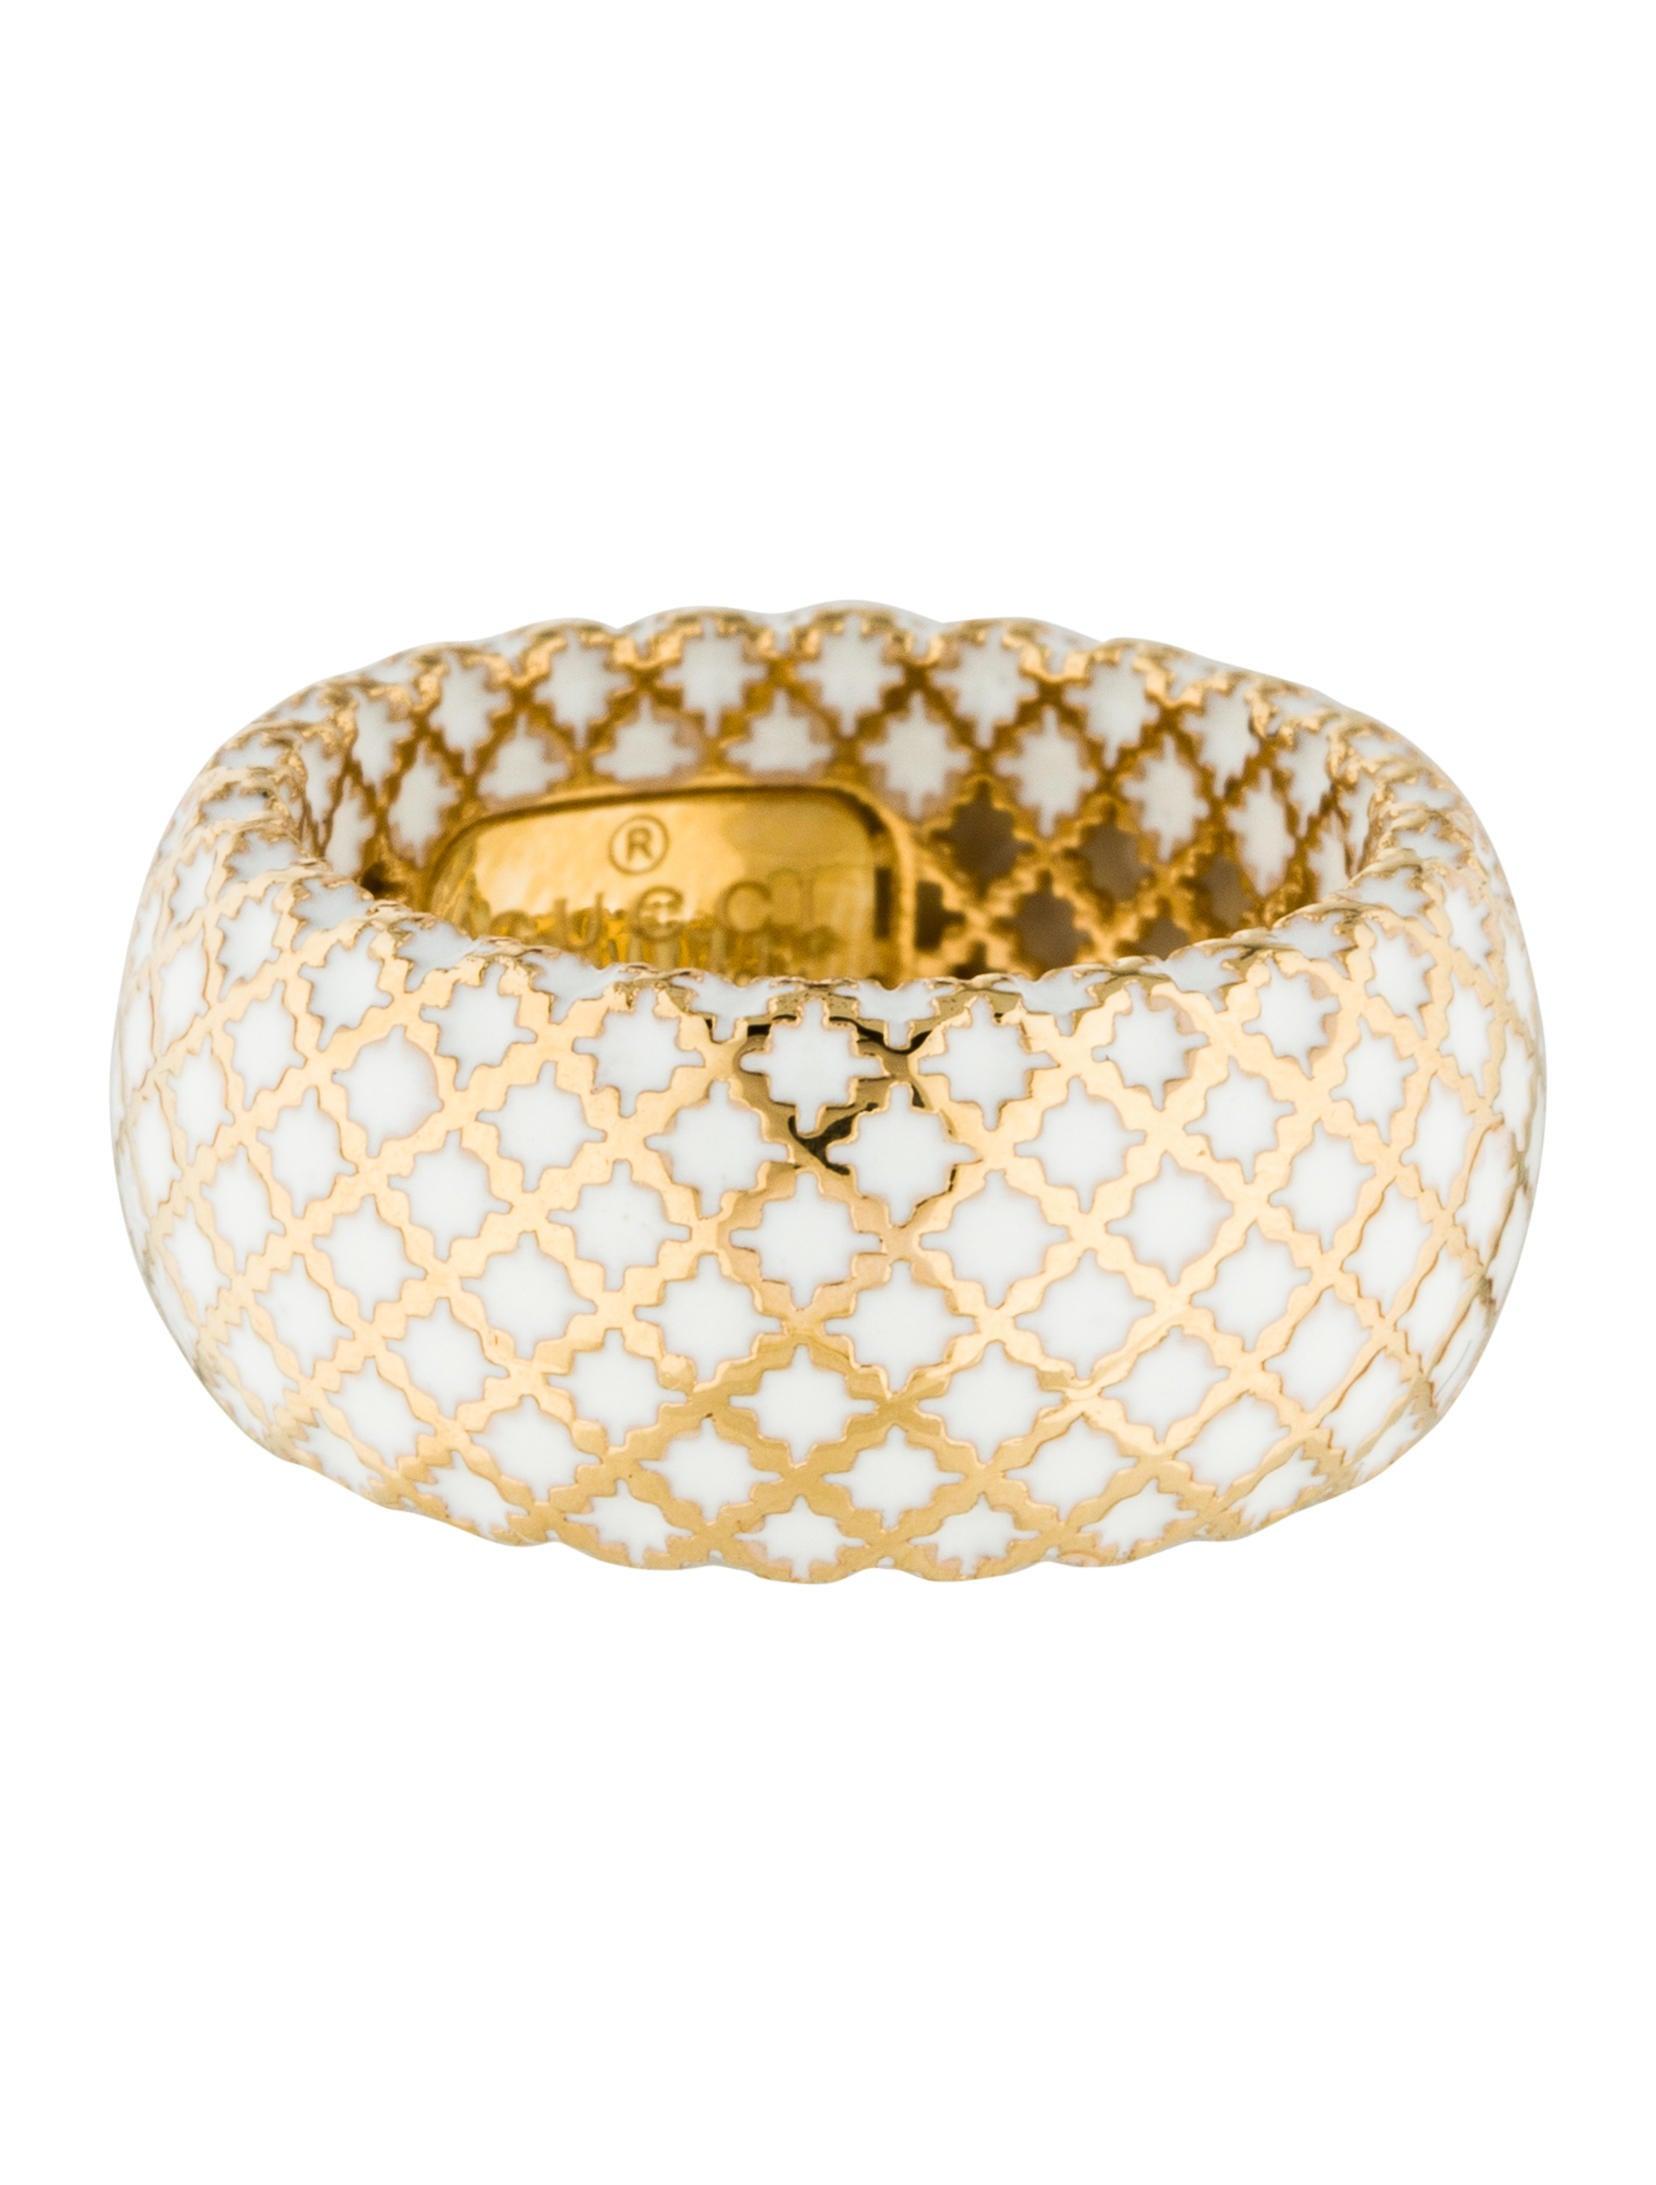 8db36cc0b Gucci Diamantissima Light Ring - Rings - GUC147631 | The RealReal